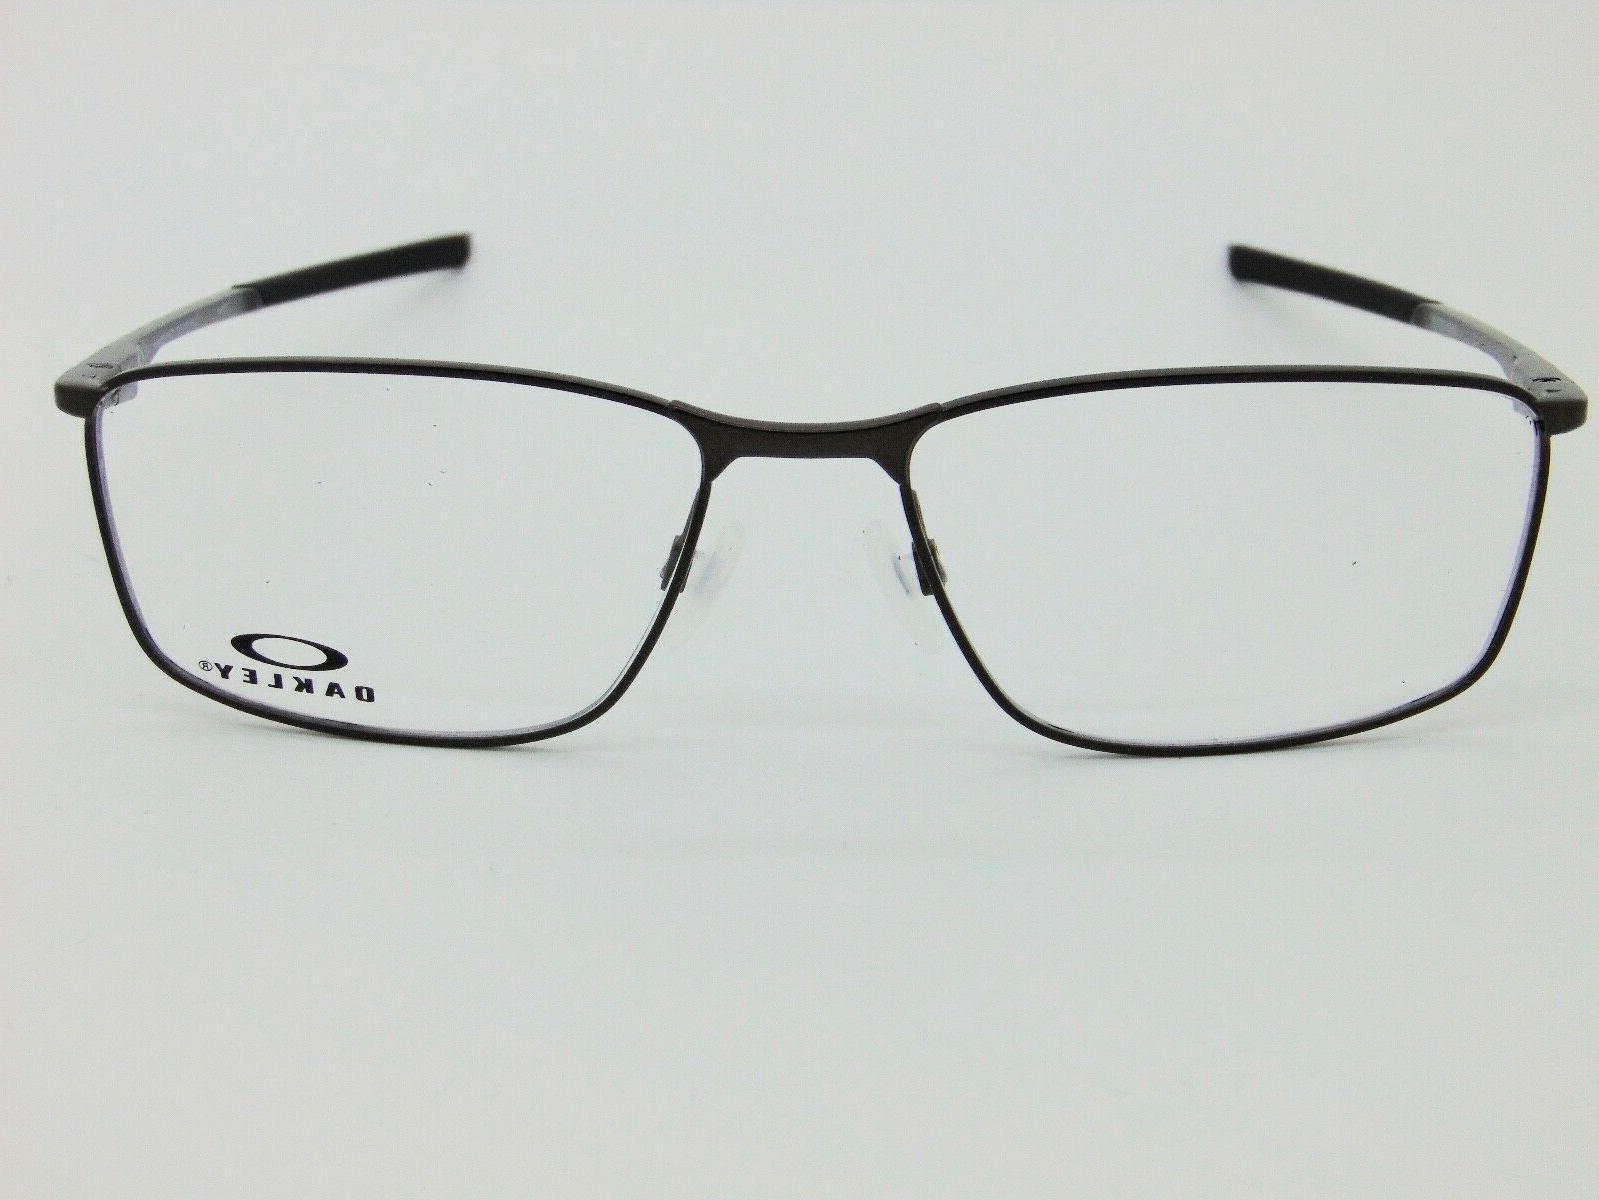 OAKLEY Satin 57mm Authentic Eyeglasses